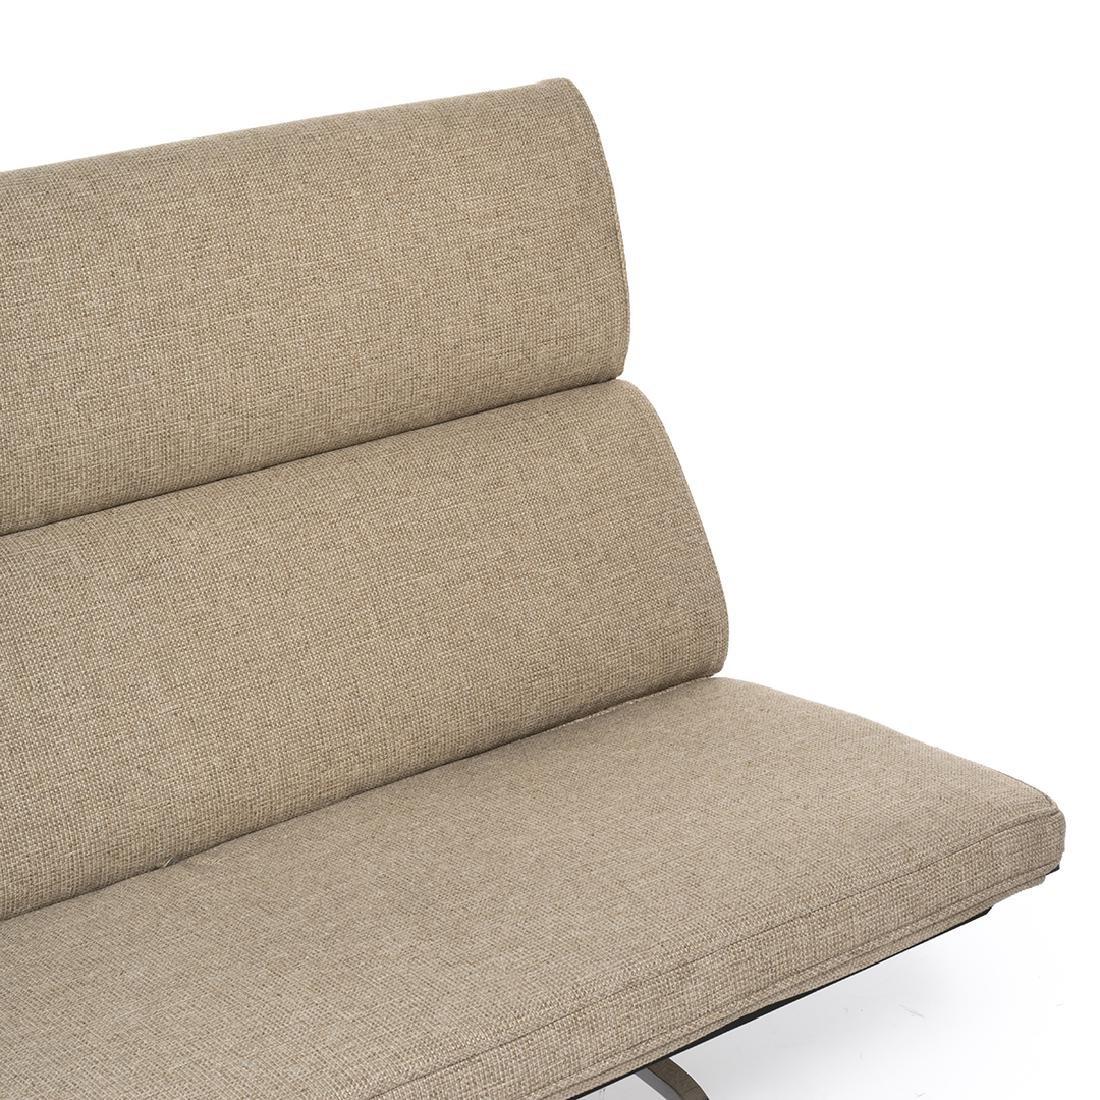 Eames Compact Sofa - 5